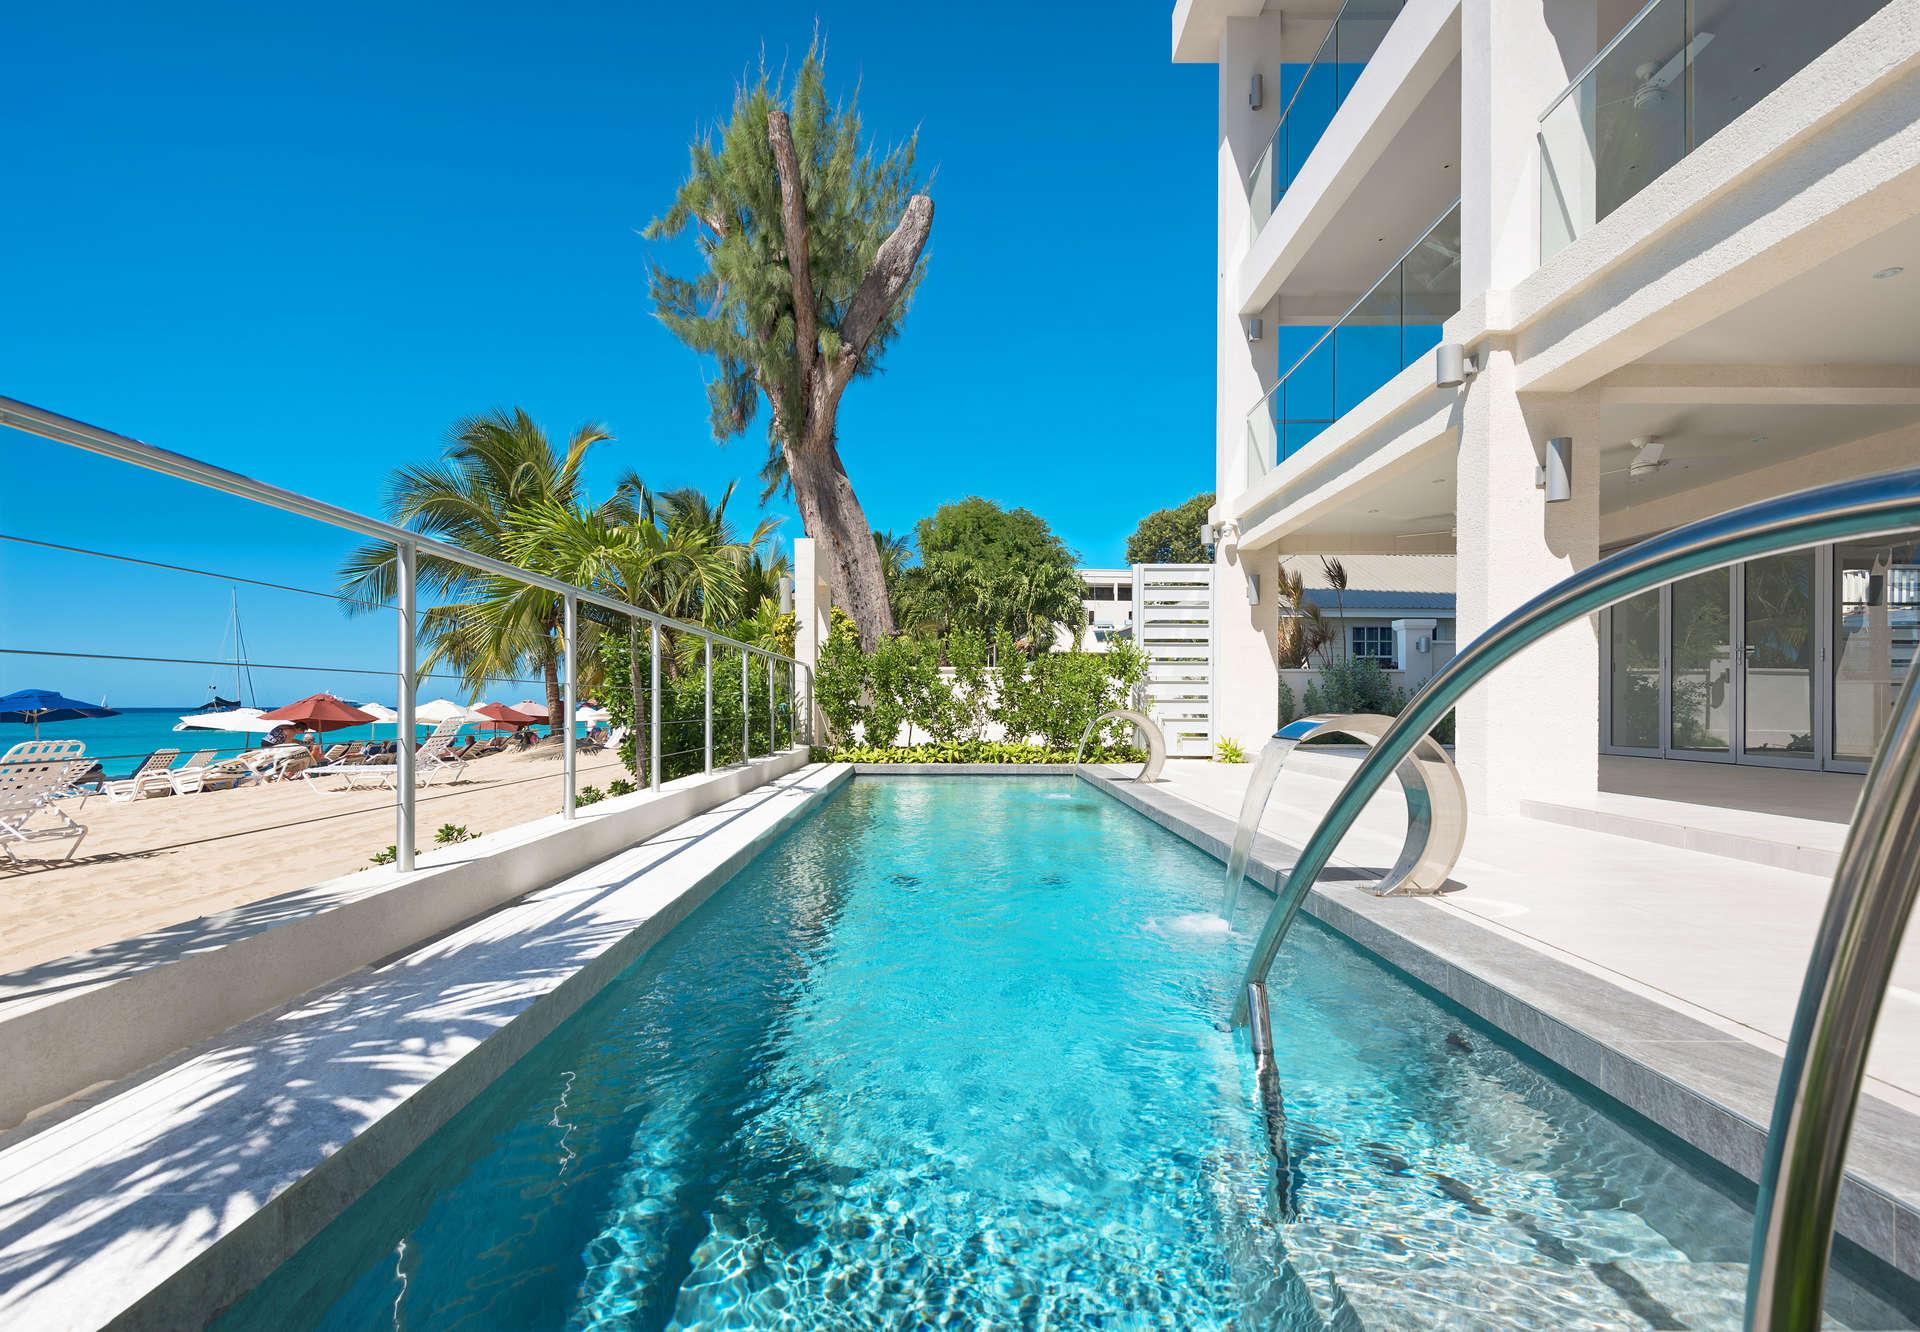 Luxury villa rentals caribbean - Barbados - St james - Paynes bay - The Villa at the St. James - Image 1/15